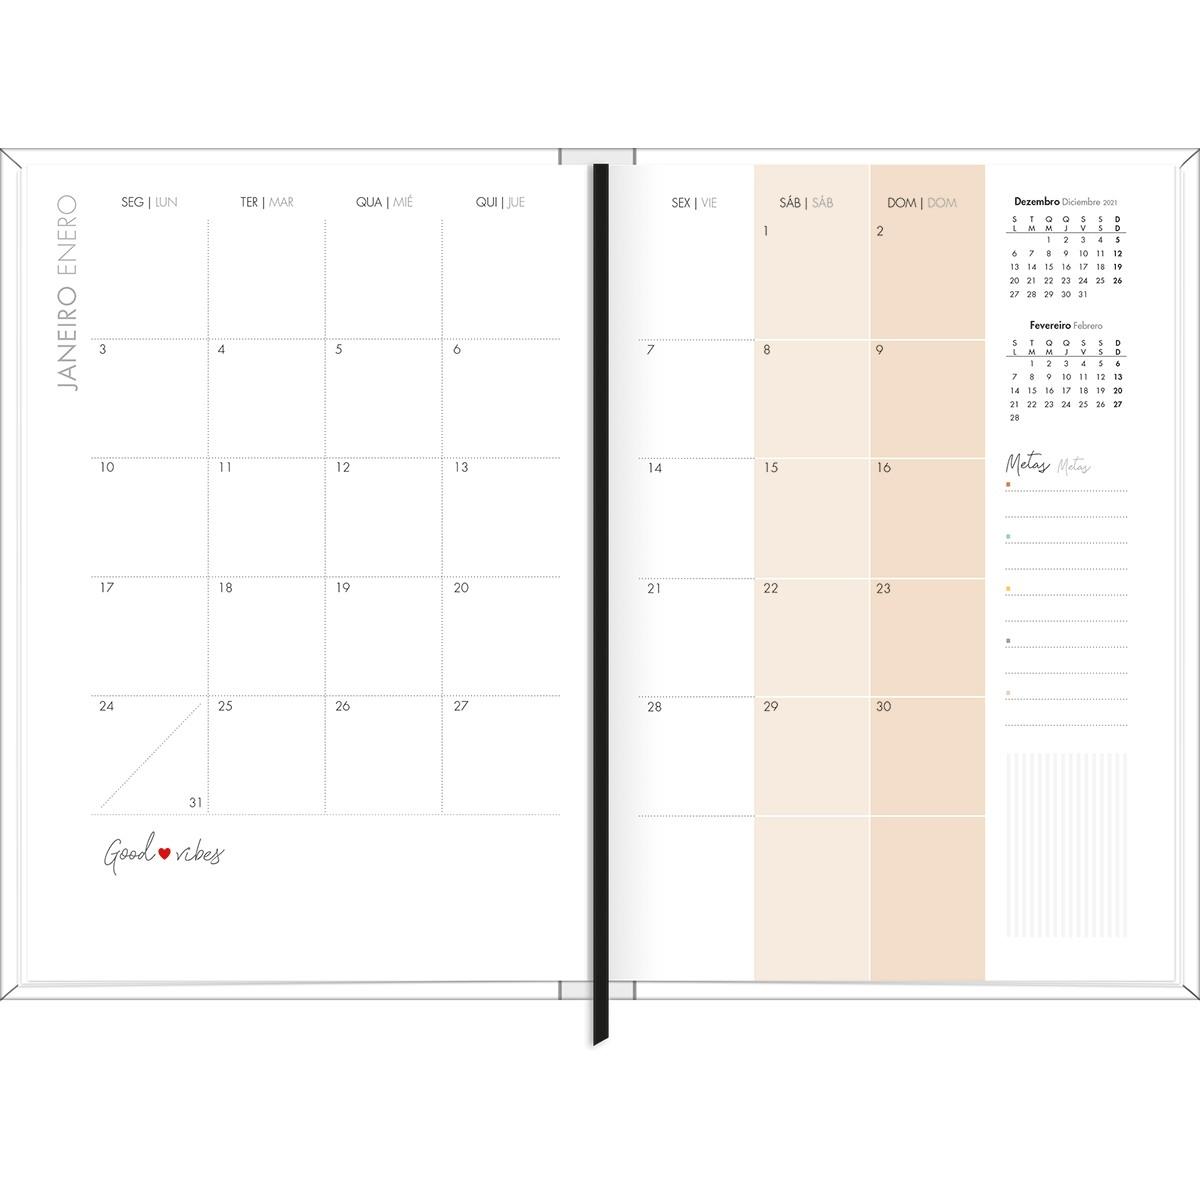 PLANNER COSTURADO 13,4 X 19,2 CM WEST VILLAGE 2022 BRANCO